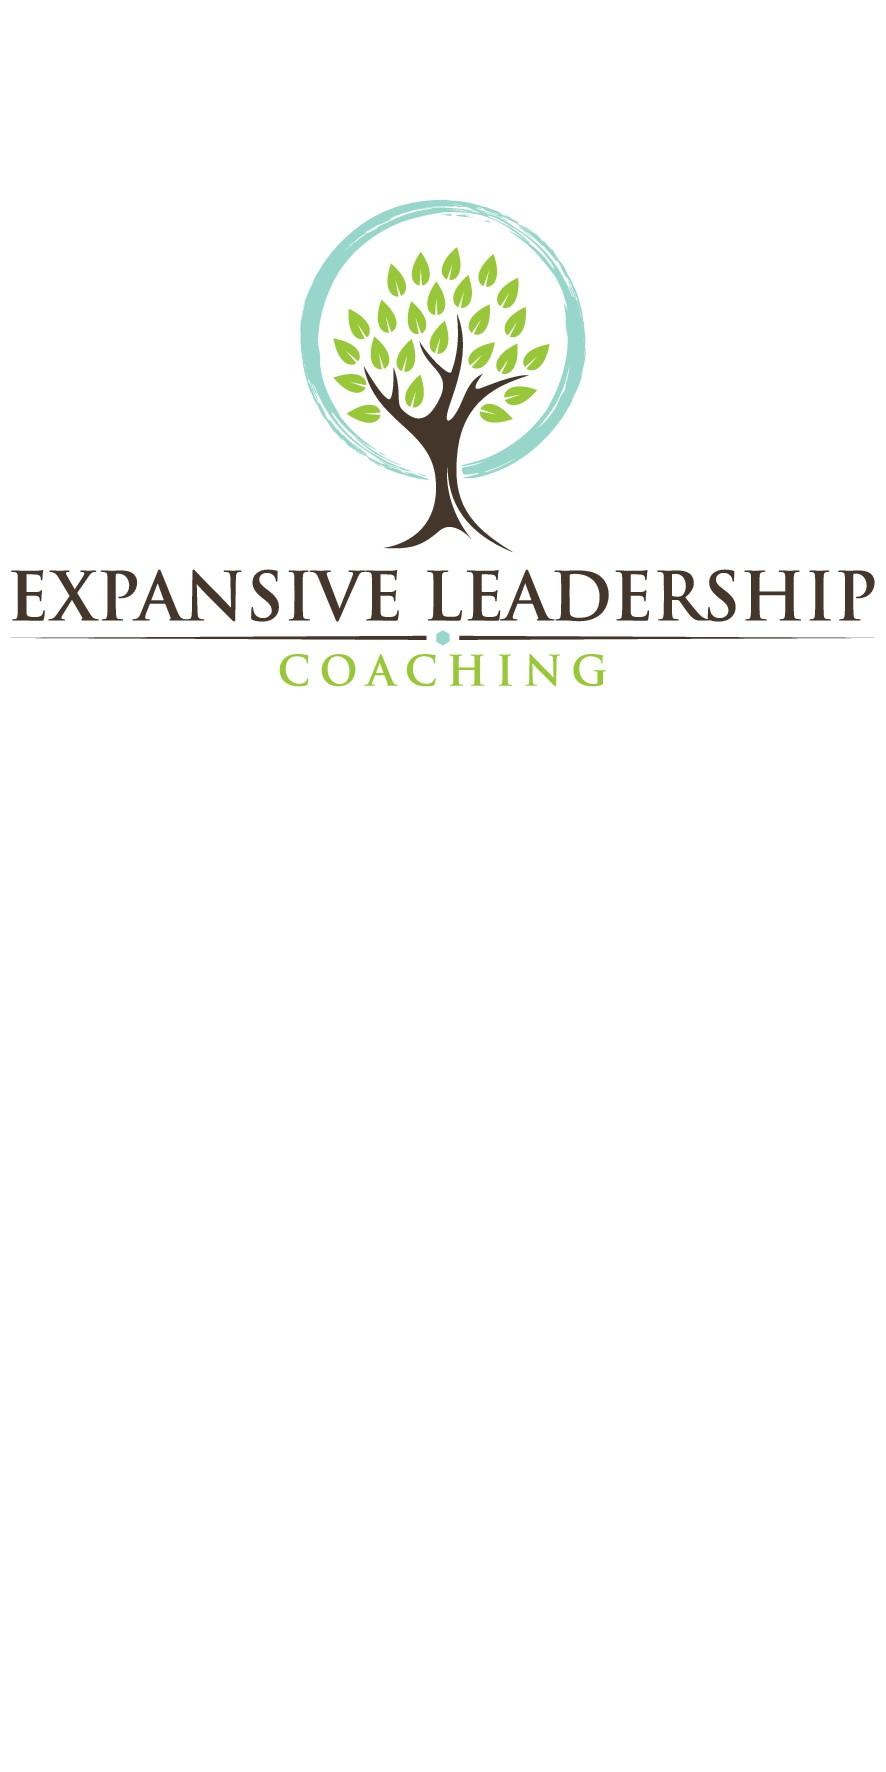 Executive Coach Needs a Logo Depicting Inspiration & Zen